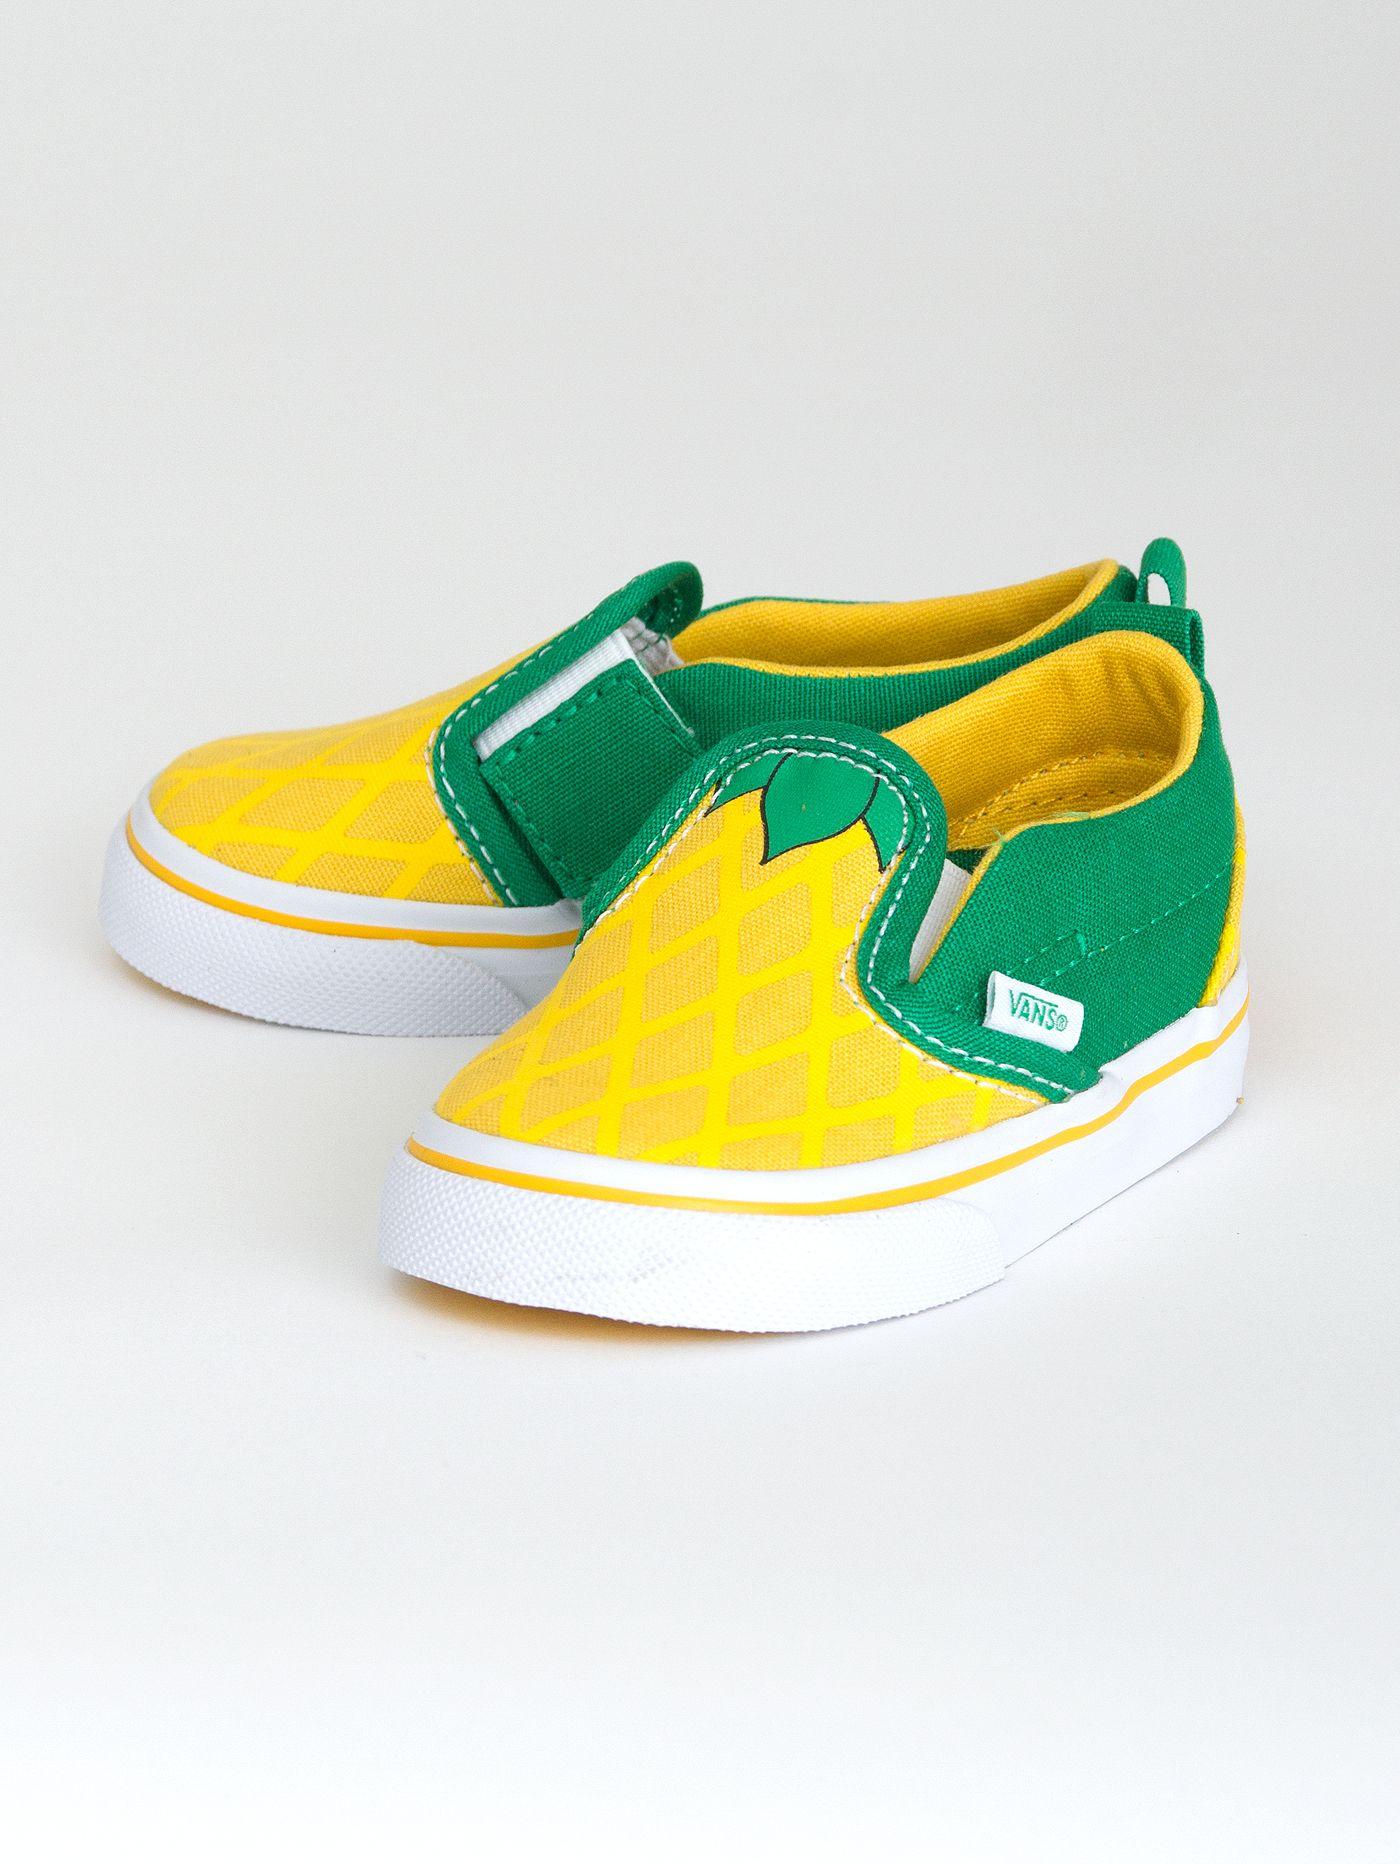 16dea2357d4e95 Vans - Kids Pineapple Sneaker